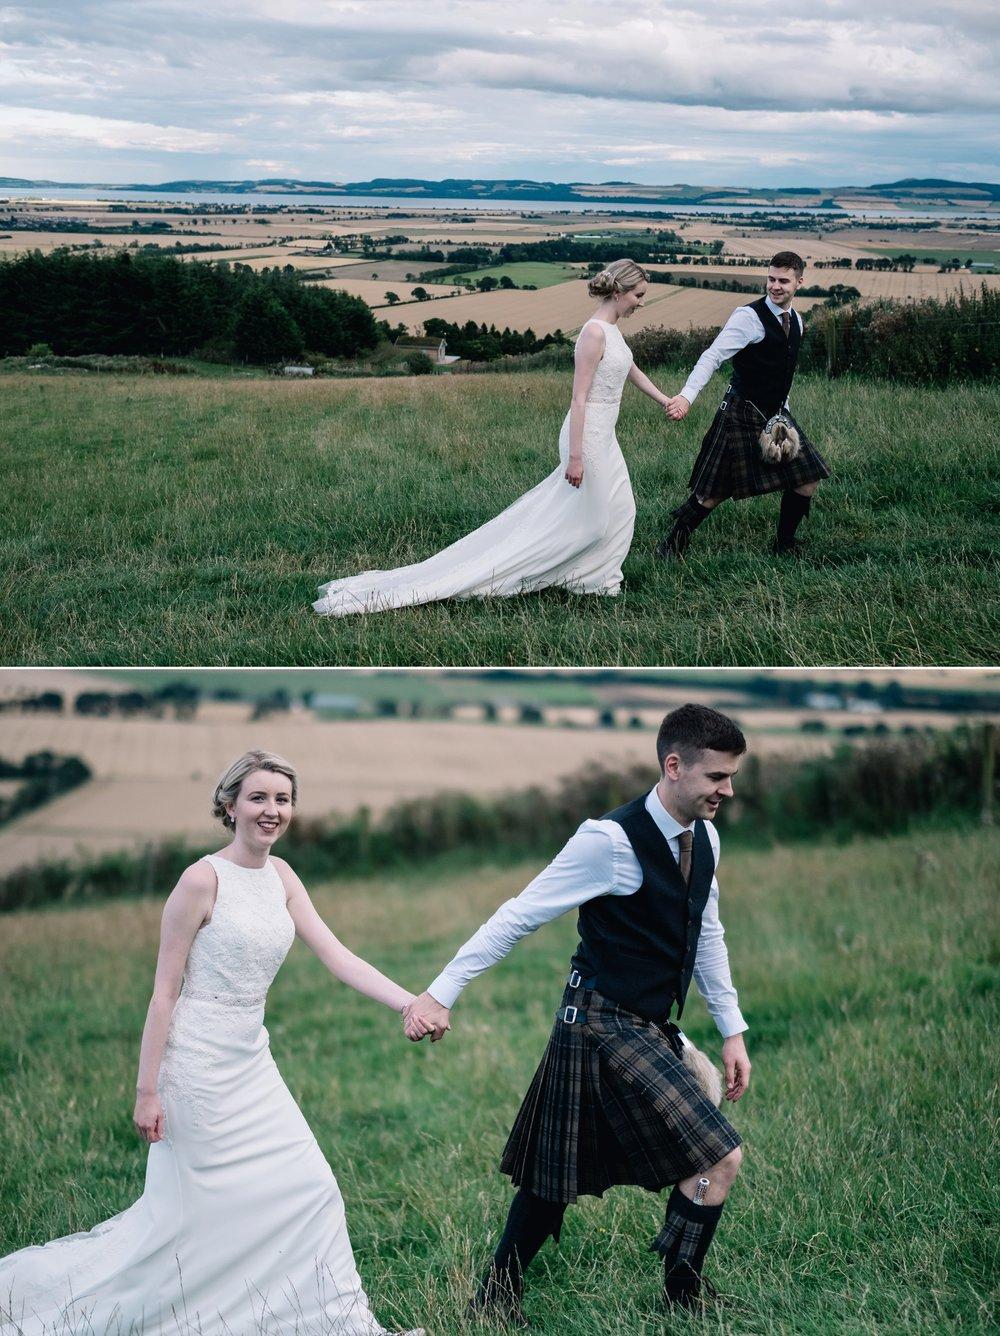 477-Rebeca-Tom-Wedding-Guardswell.JPG